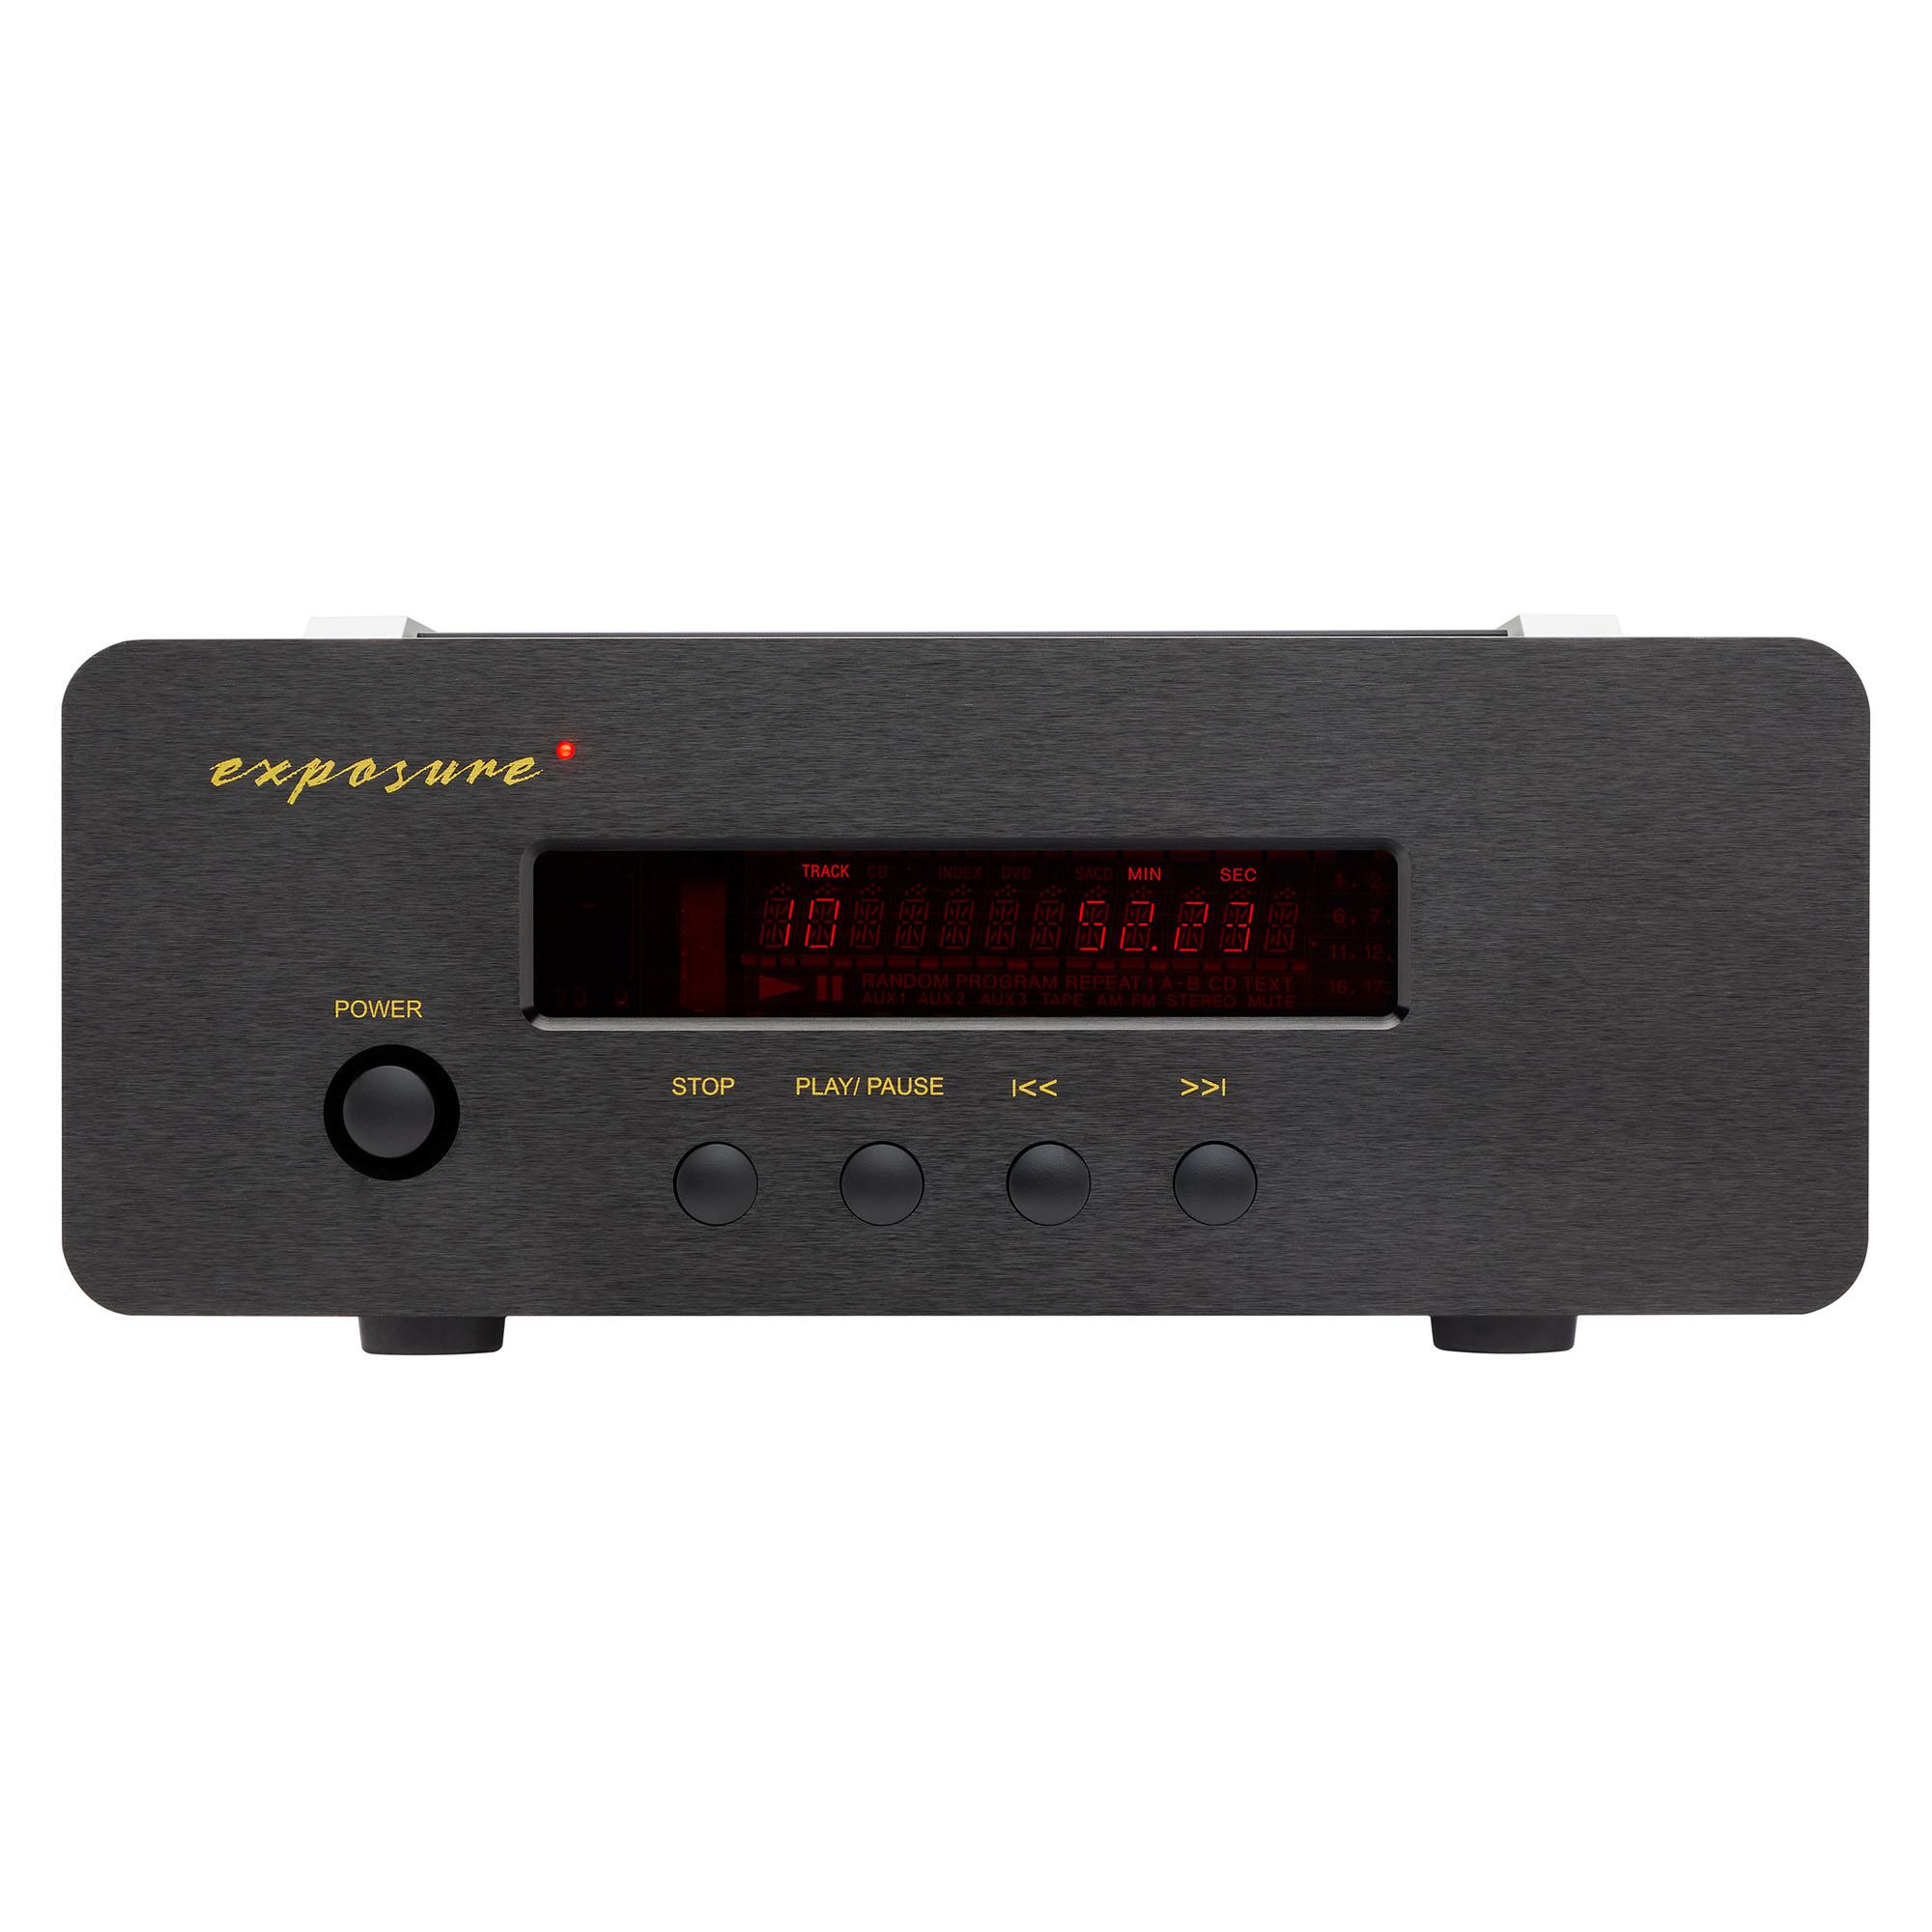 exposure xm cd speler hans audio inruil mogelijk engelse fabricageexposure xm cd speler